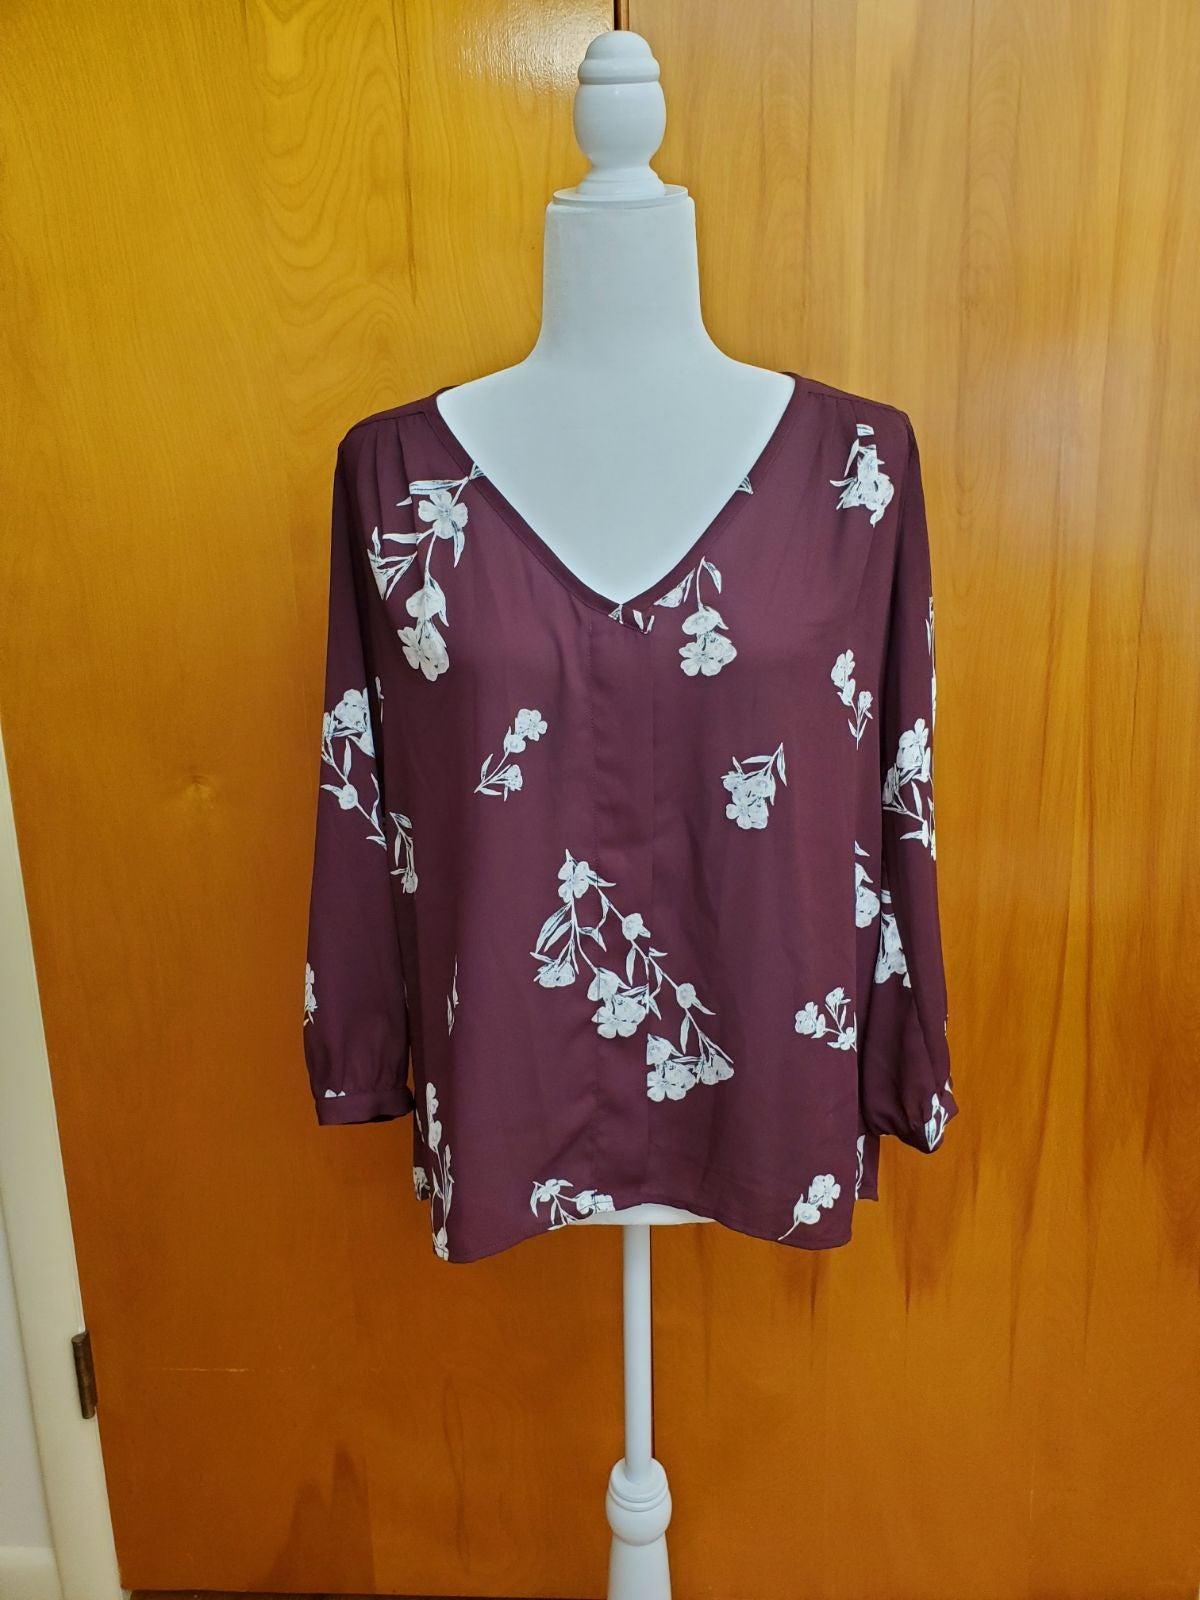 Floral burgundy 3/4 sleeve Blouse